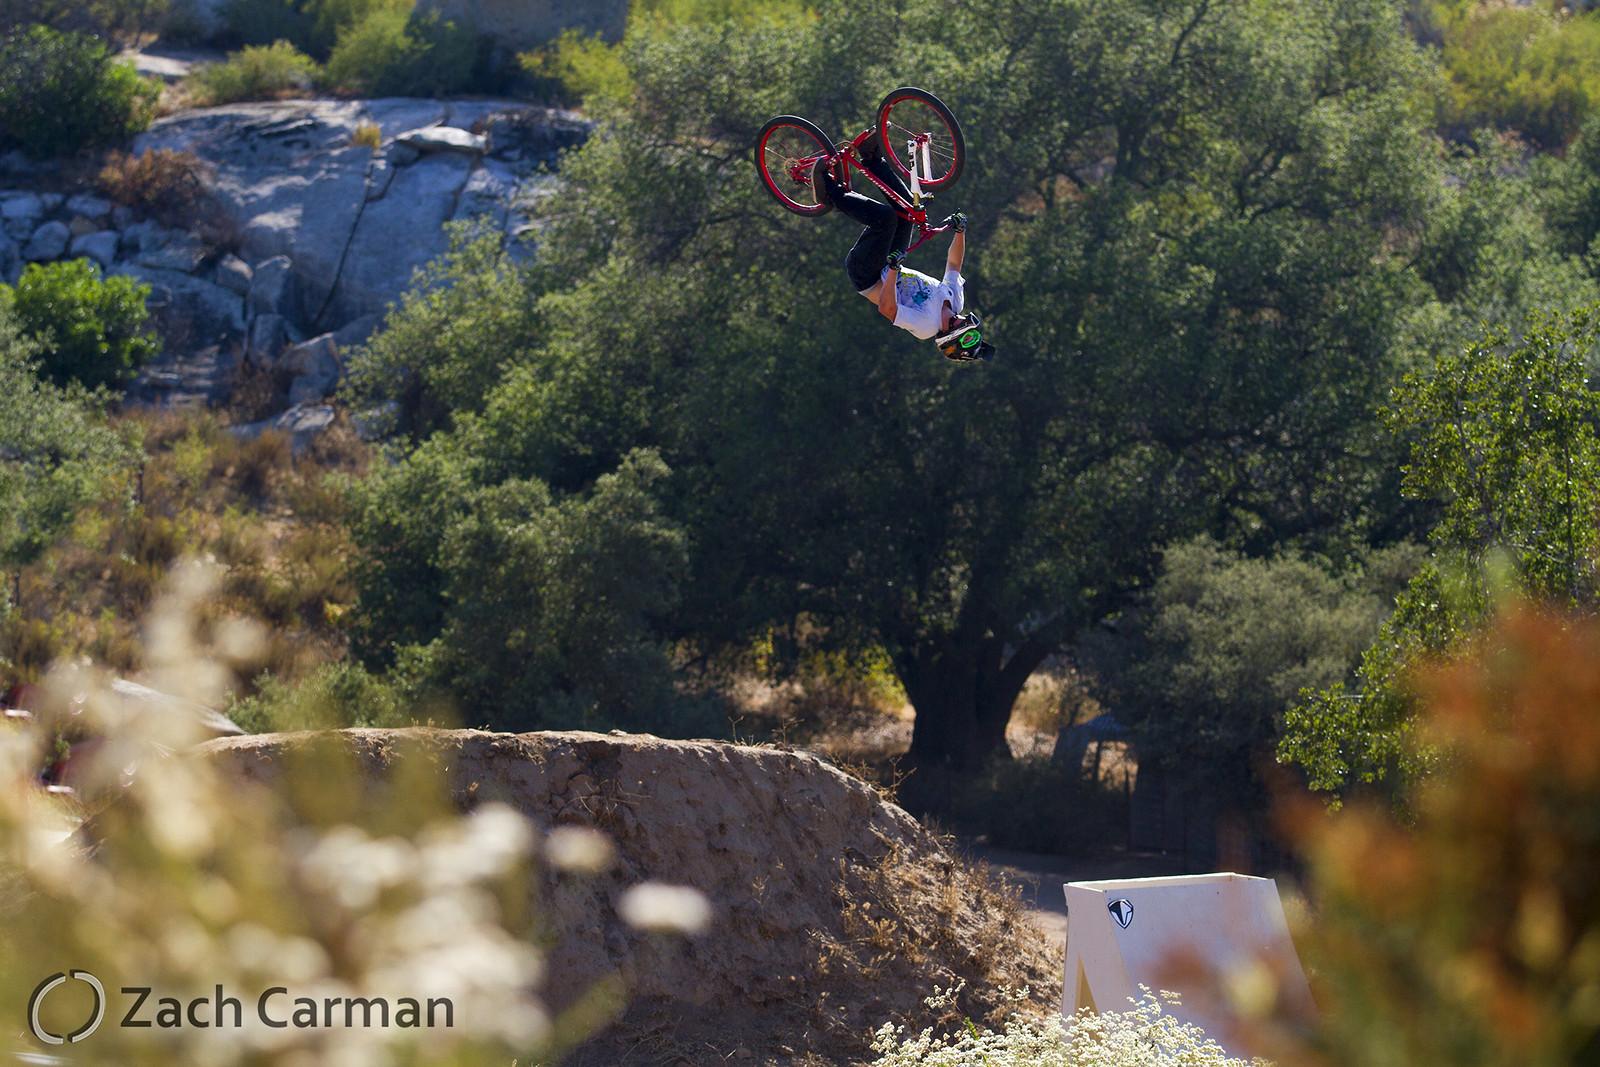 James Visser BF  - Captures by Carman - Mountain Biking Pictures - Vital MTB